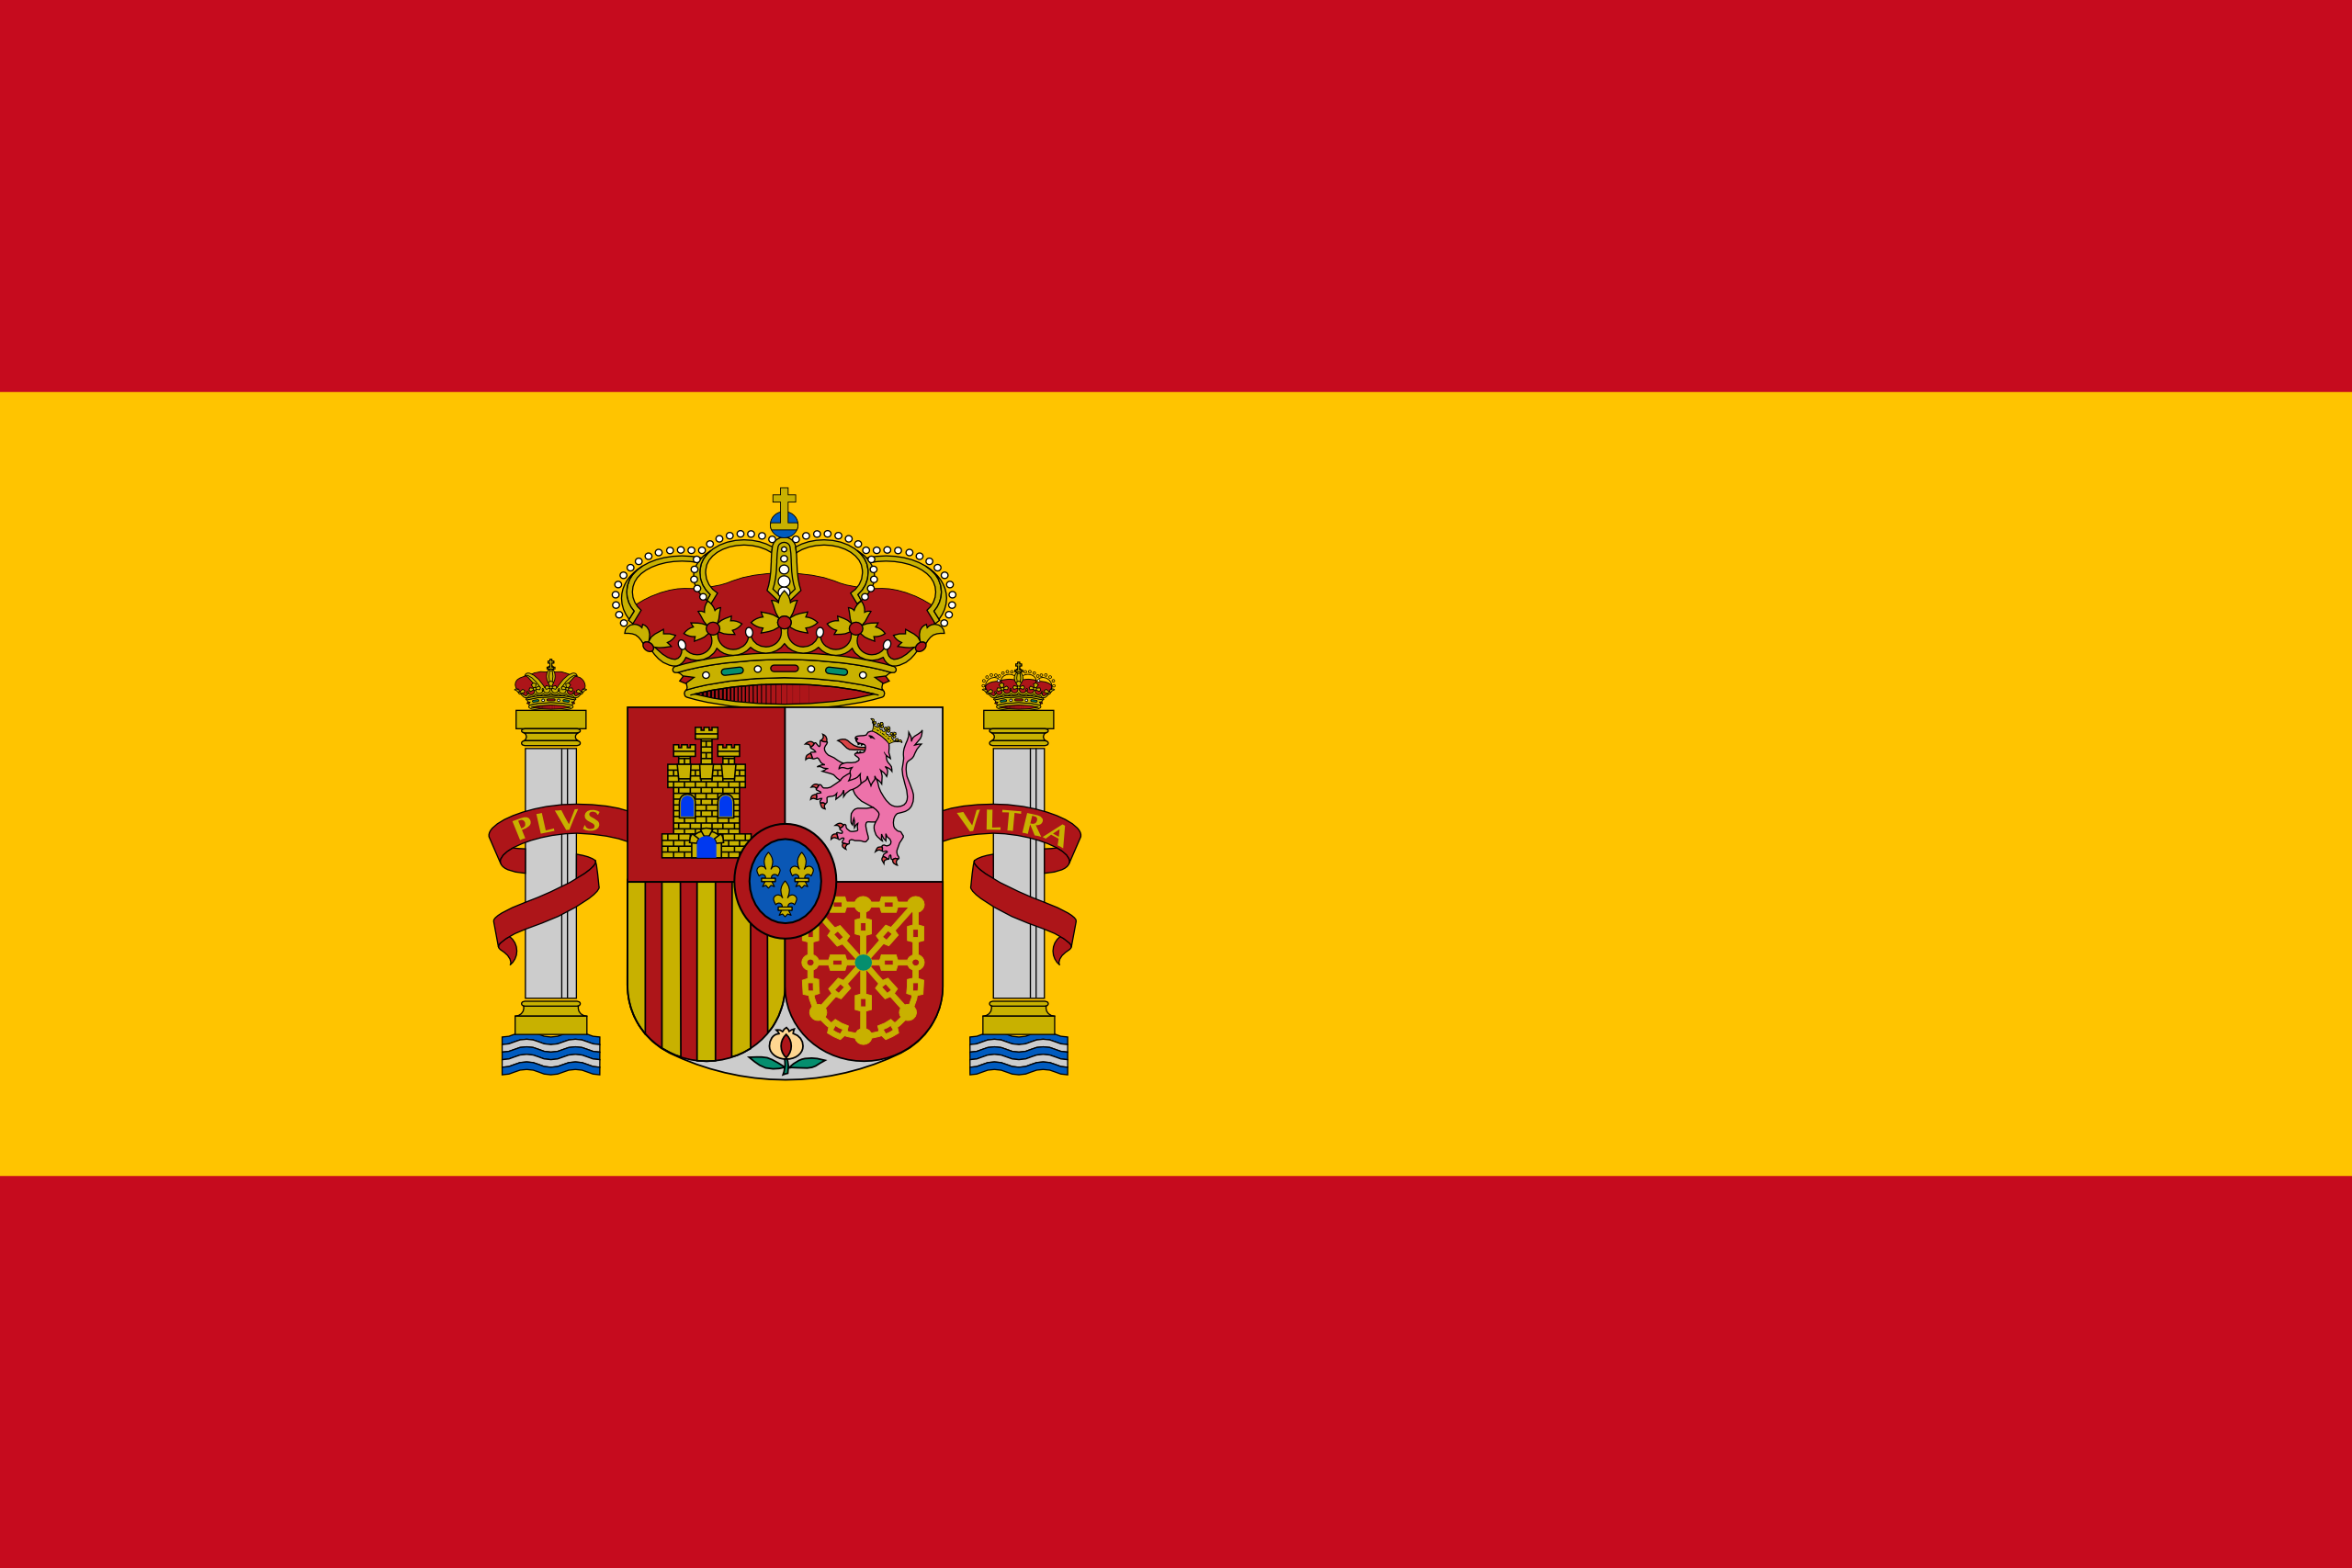 Espagne, pays, emblème, logo, symbole - Fonds d'écran HD - Professor-falken.com